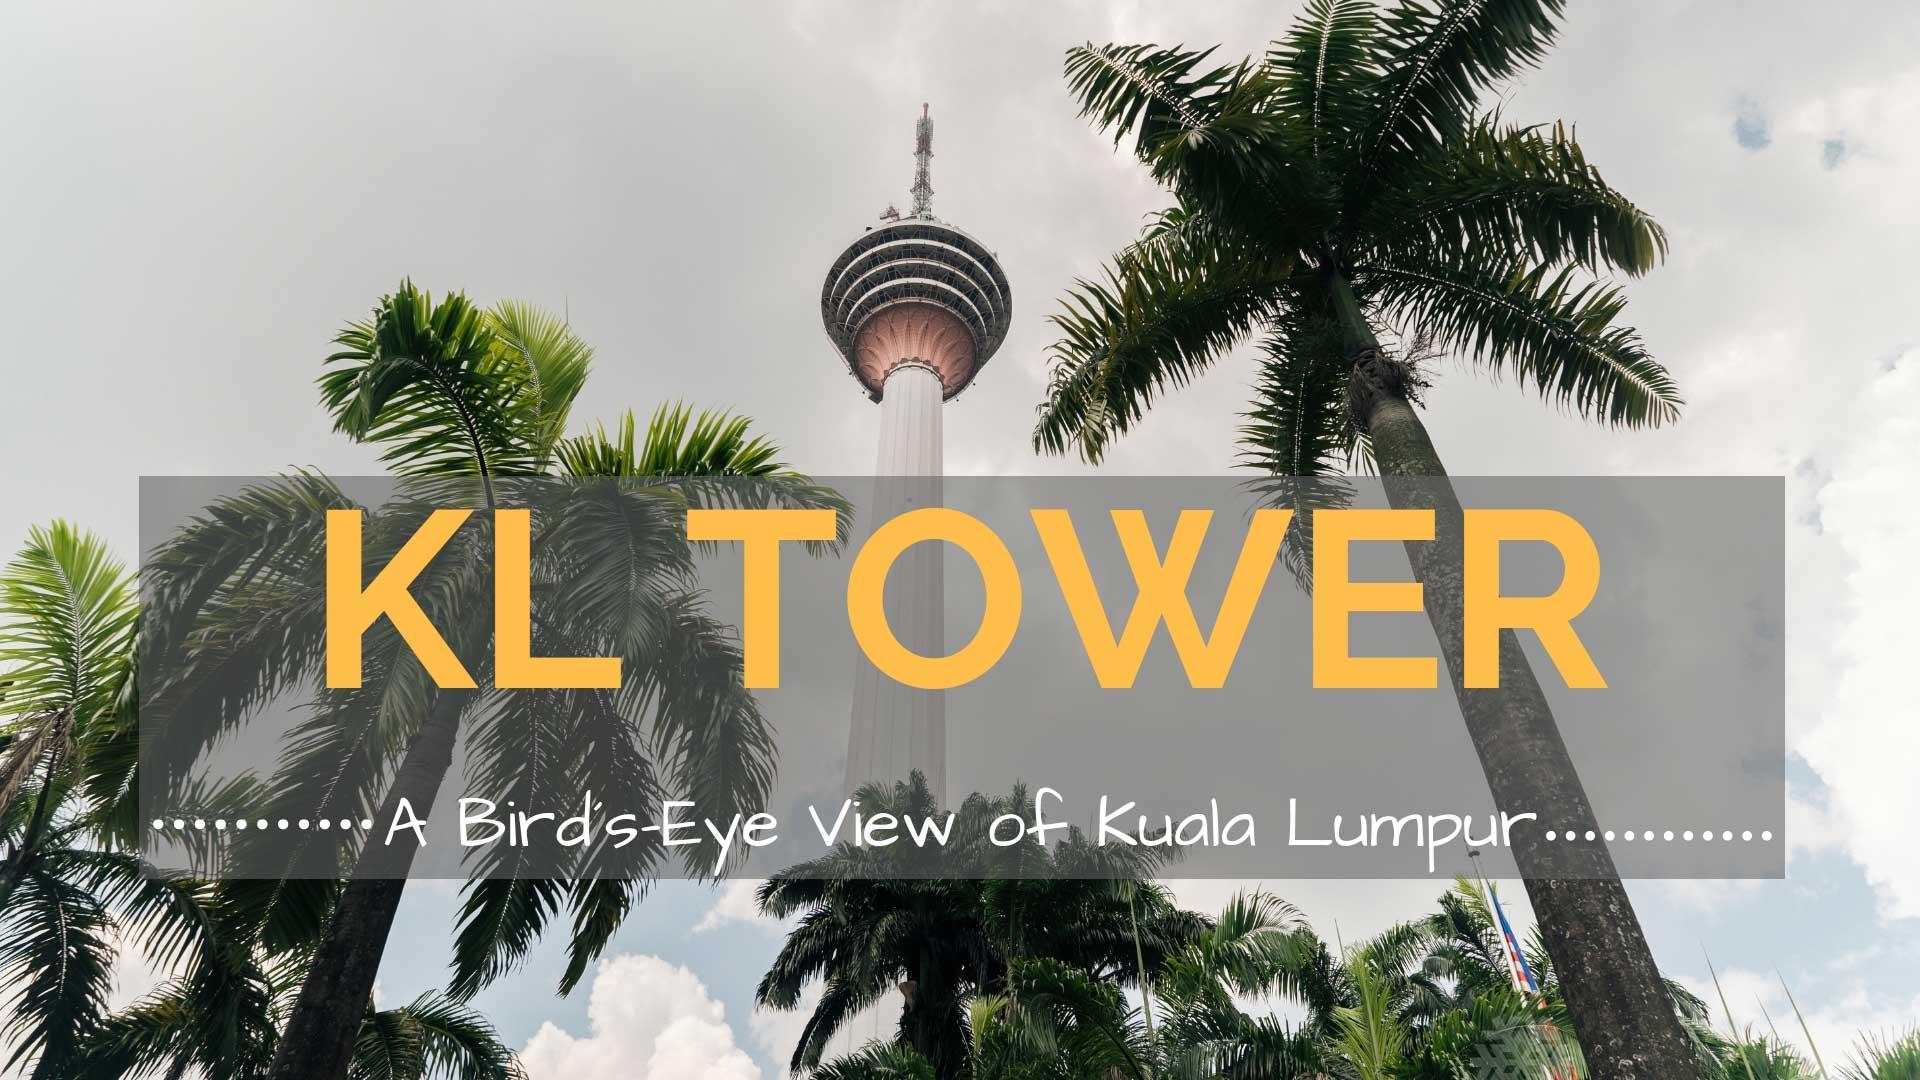 Get A Bird's-Eye View of Kuala Lumpur City – KL Tower